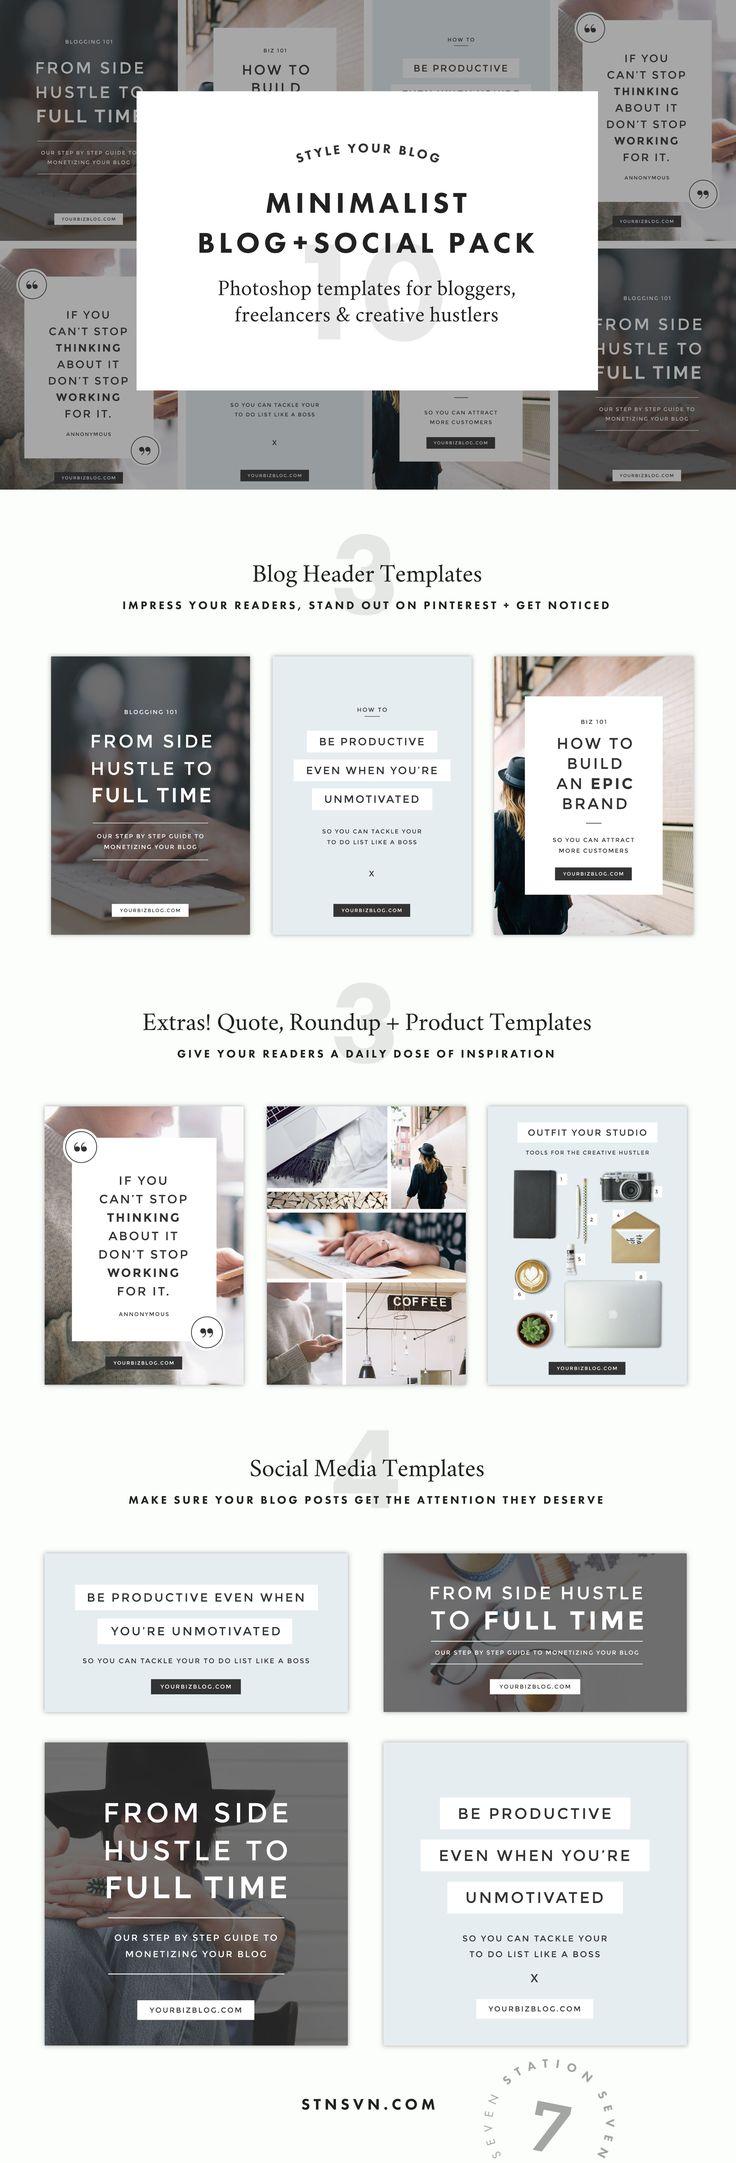 Design banner minimalist - Minimalist Blog Social Pack By Station Seven On Creativemarket